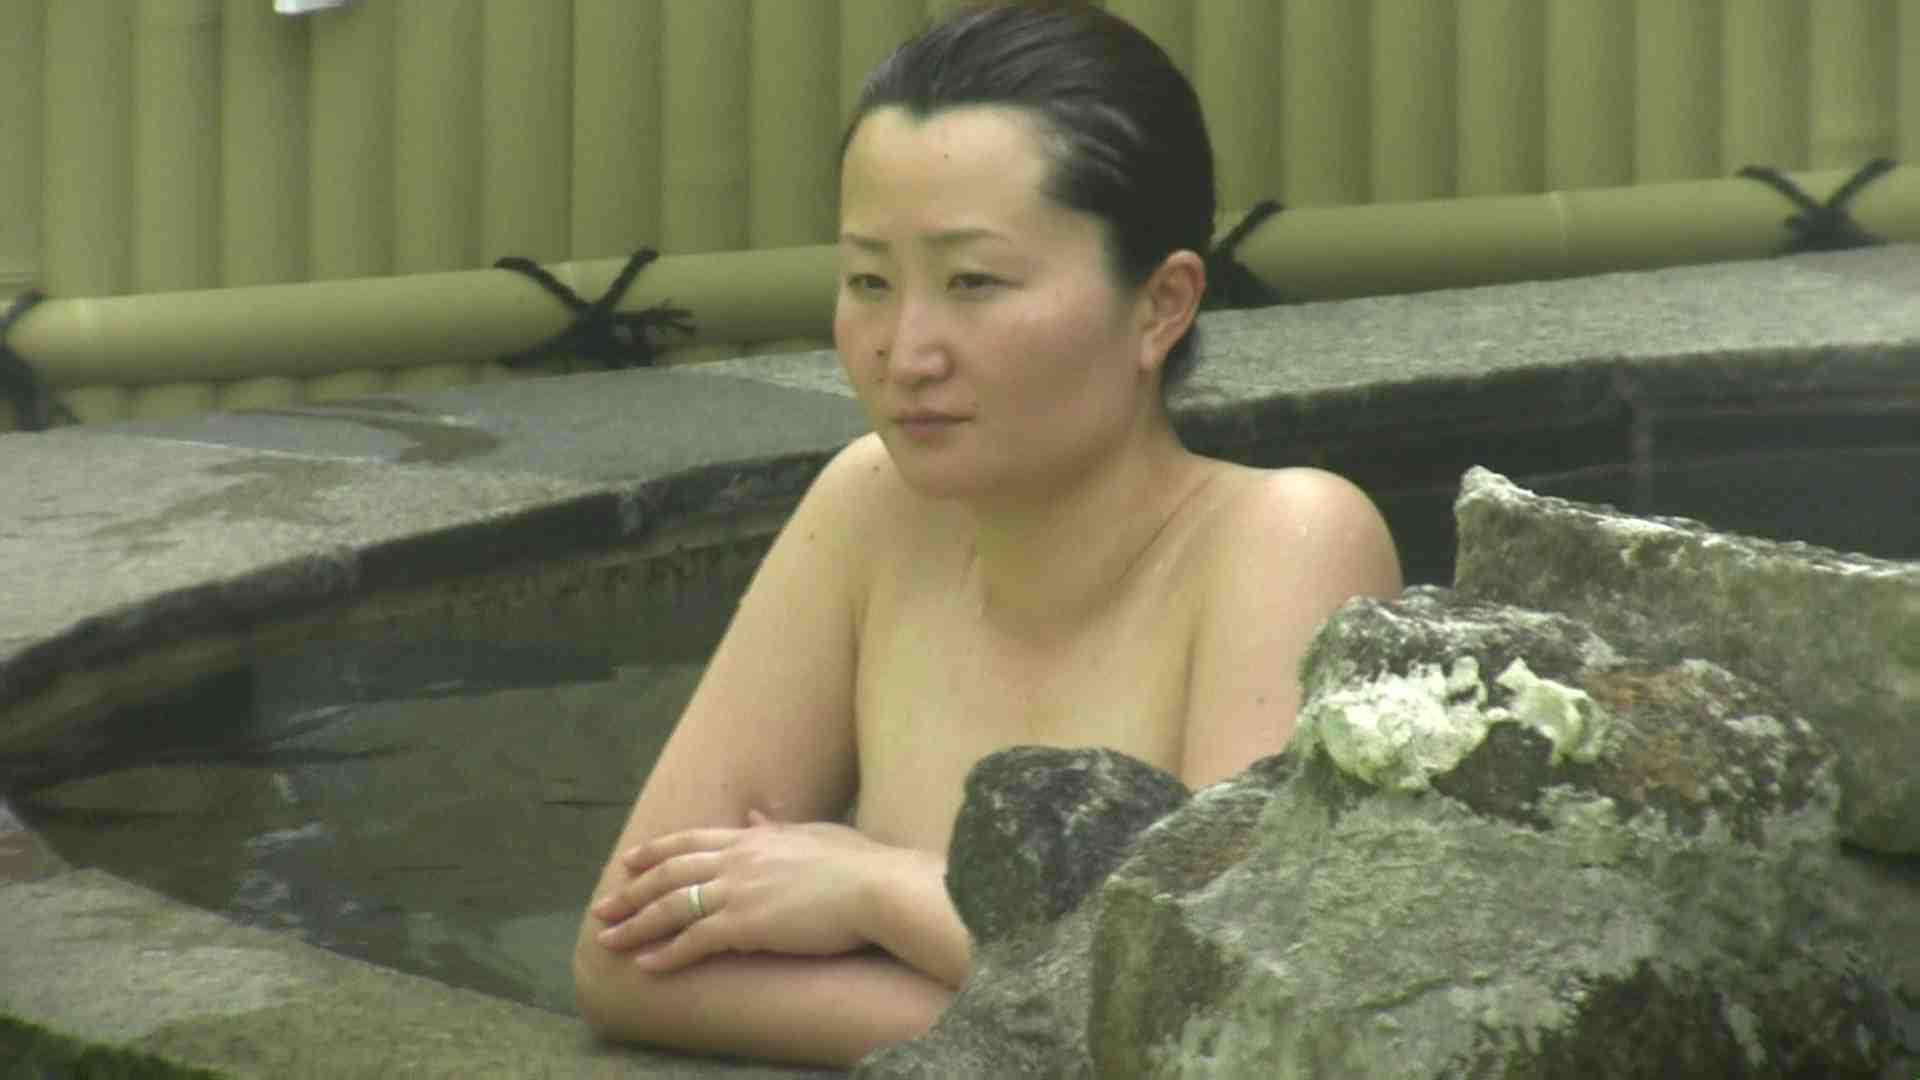 Aquaな露天風呂Vol.632 露天 戯れ無修正画像 70画像 62